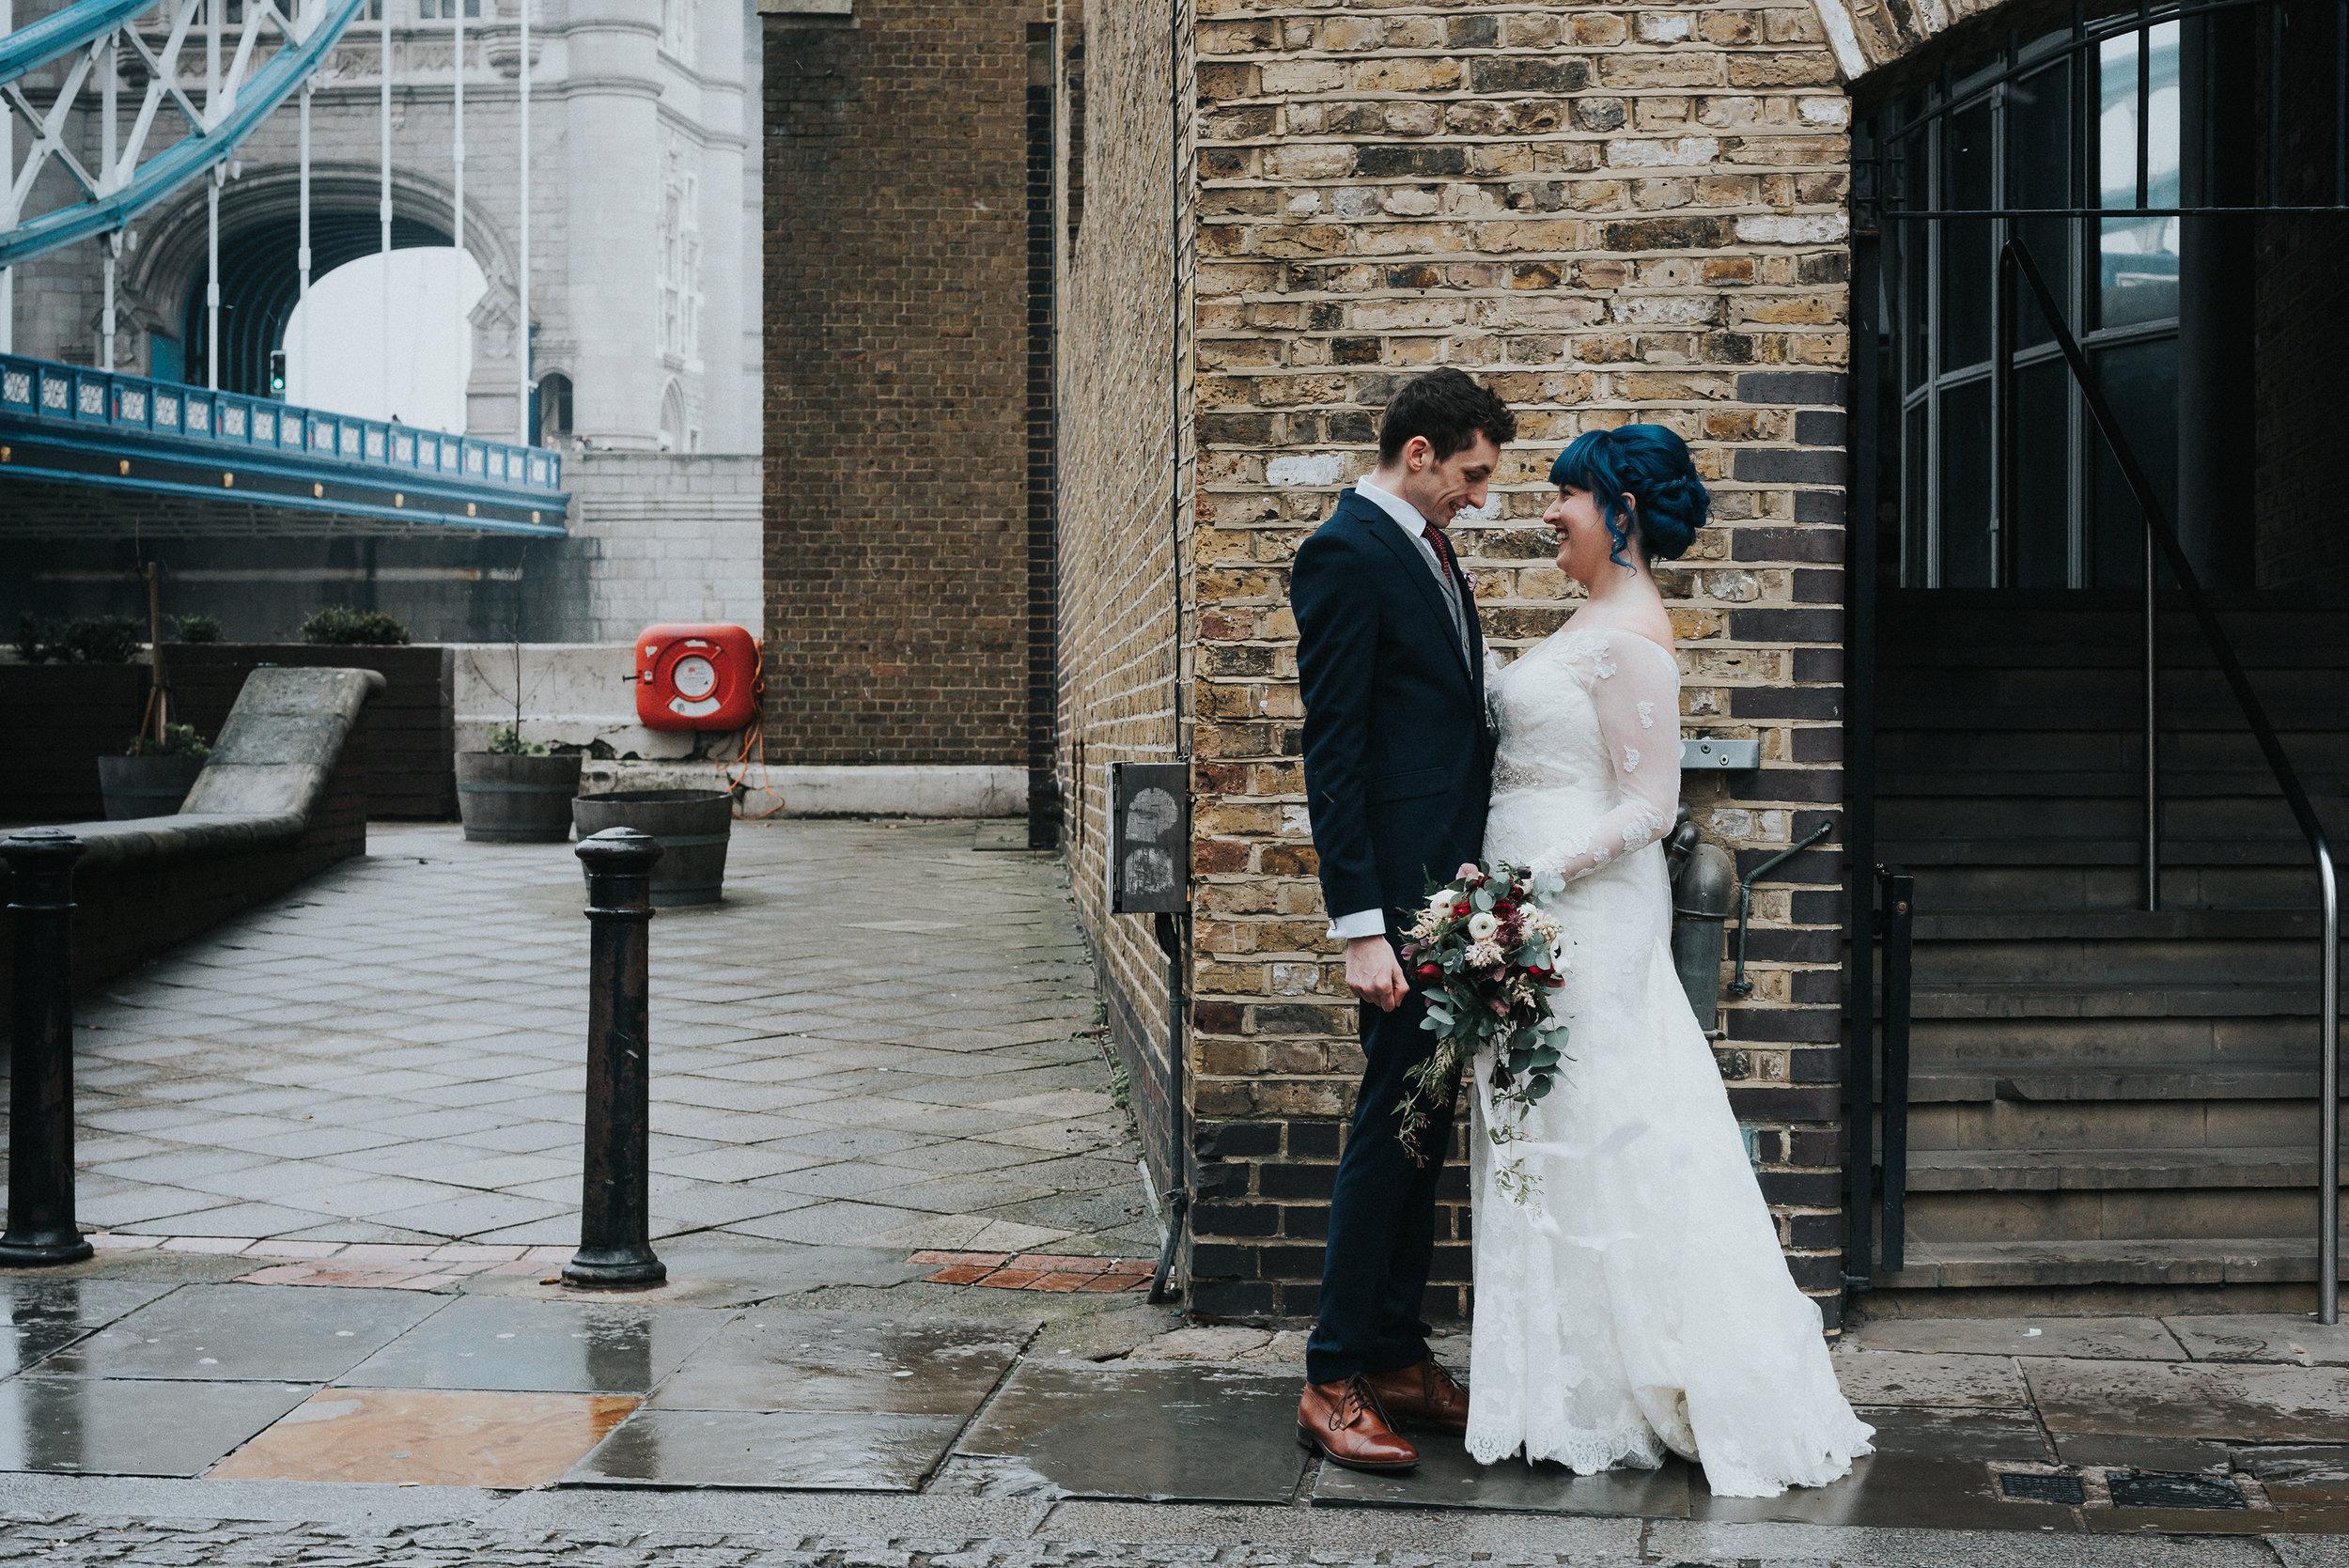 London-Chic-Alternative-Wedding-Jay-Tunbridge-Photographic-Co-10.jpg